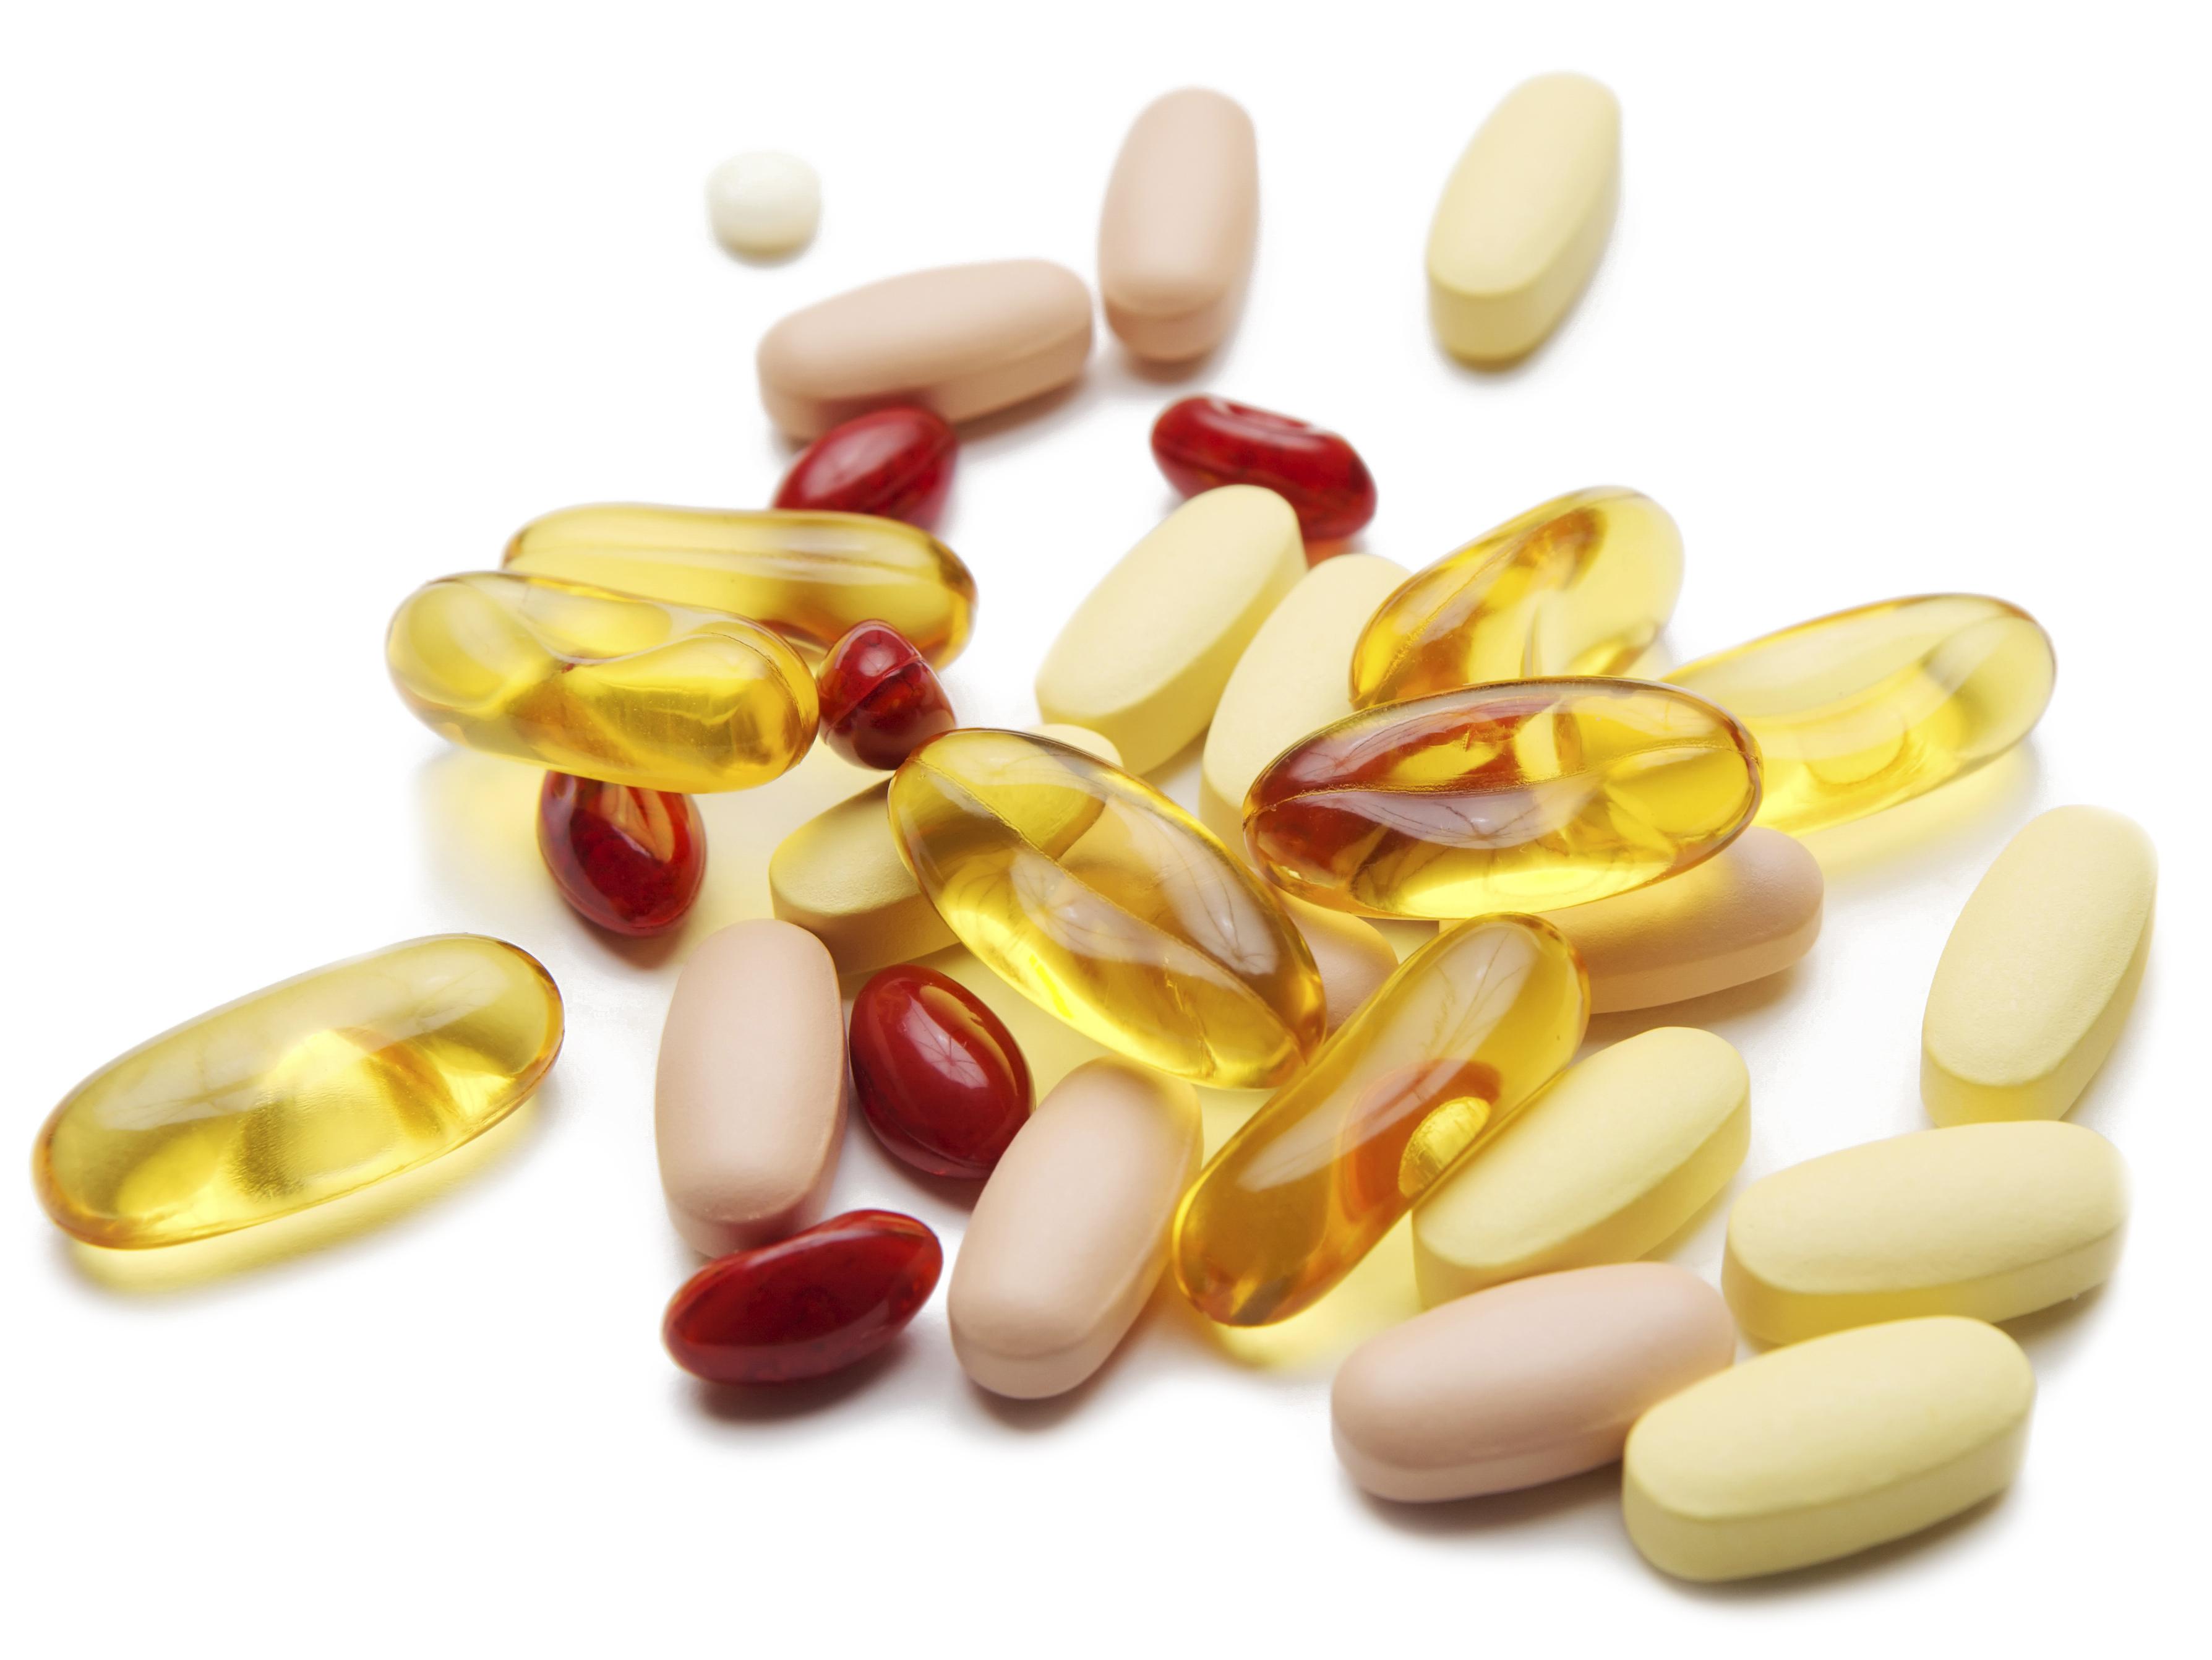 Assortment of vitamin pills